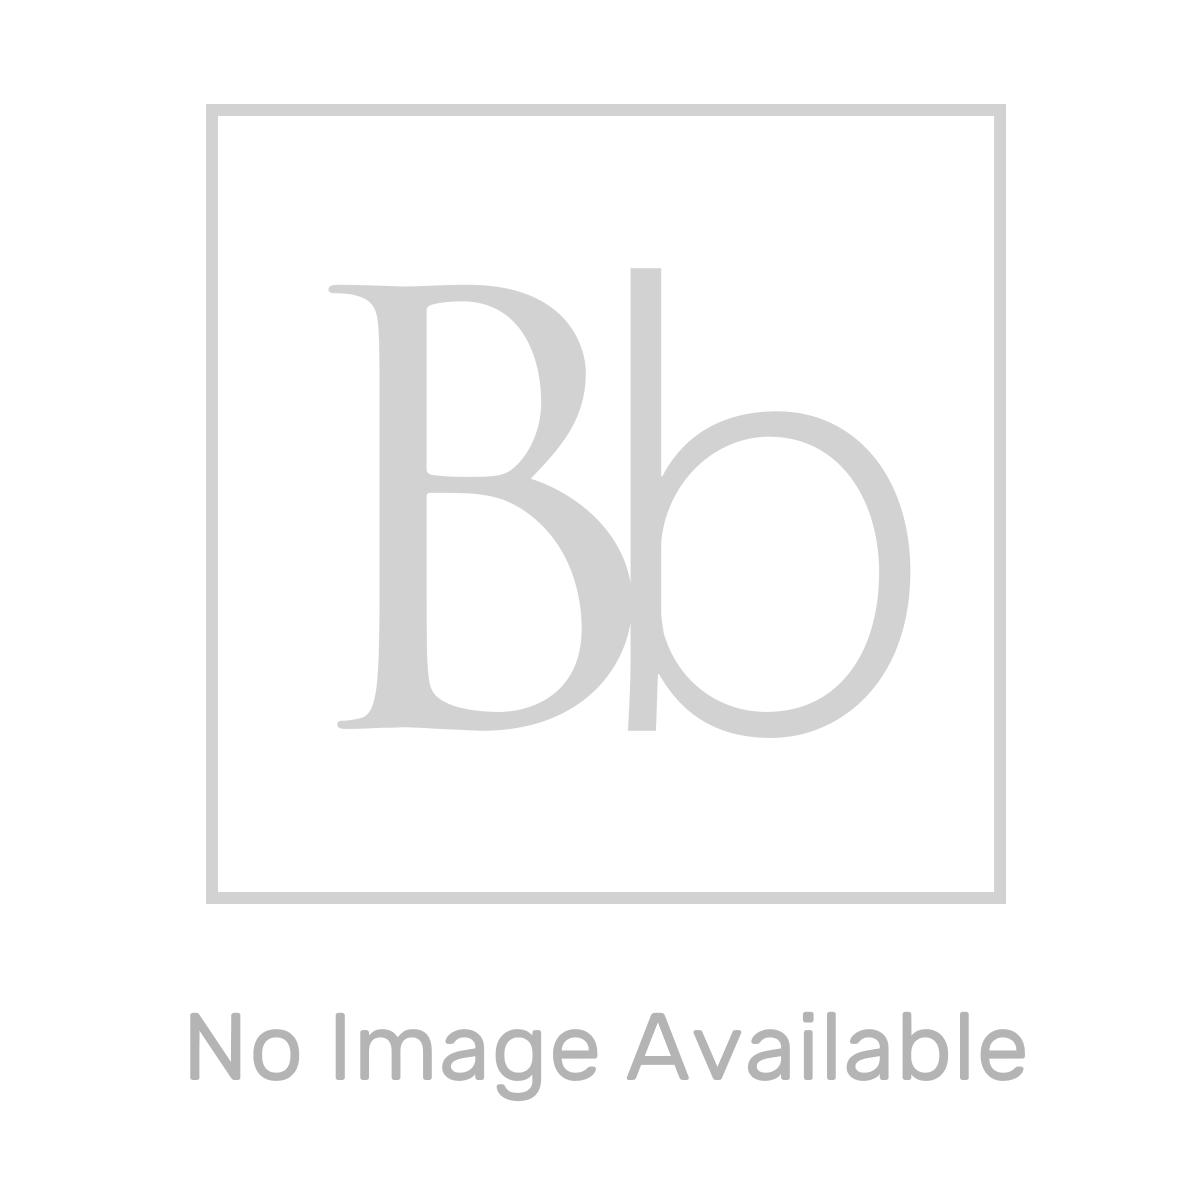 Stuart Turner 46553 CH 4-30 Centrifugal Multistage 2.5 Bar Pump